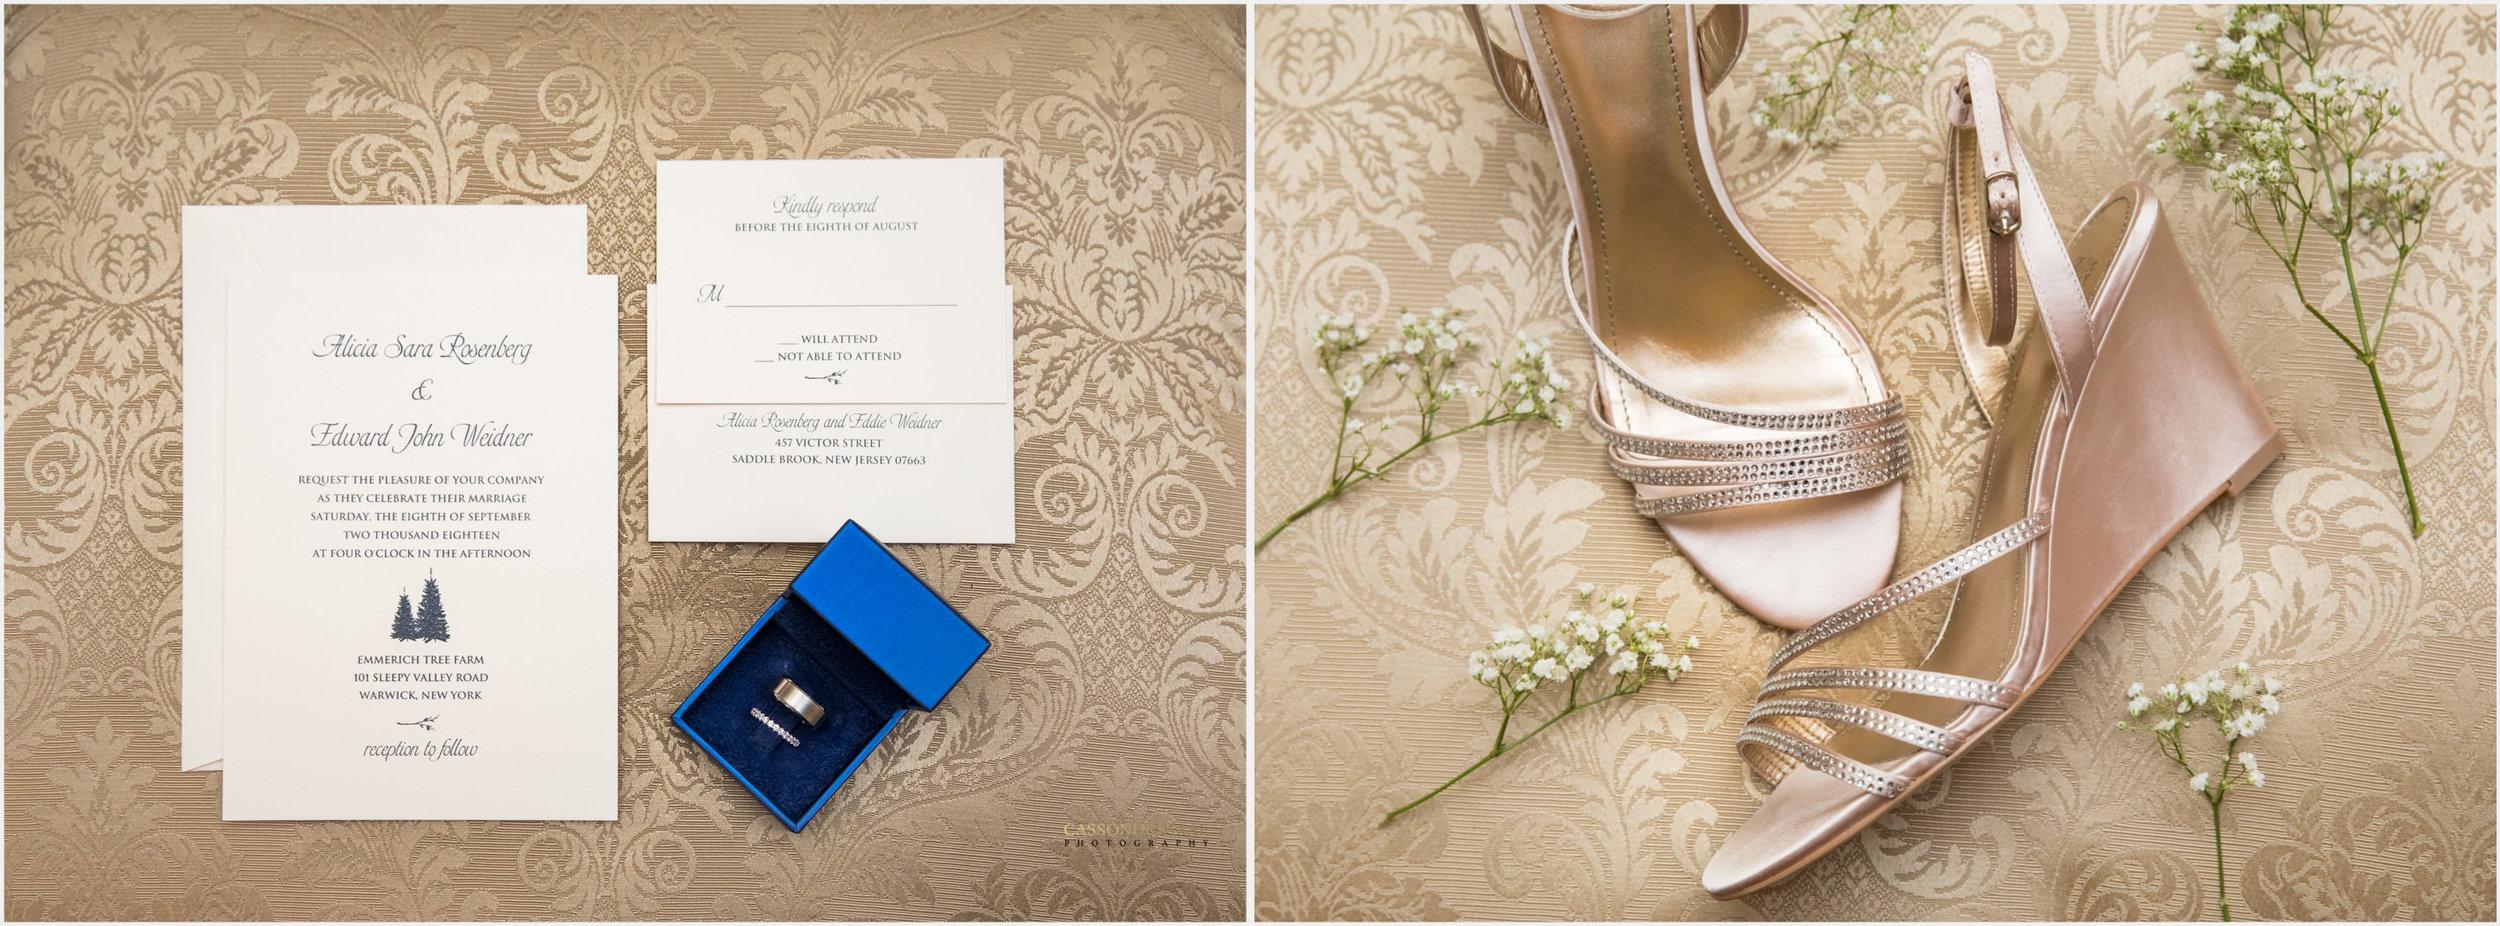 Cassondre Mae Photography Emmerich Tree Farm Wedding 13.jpg